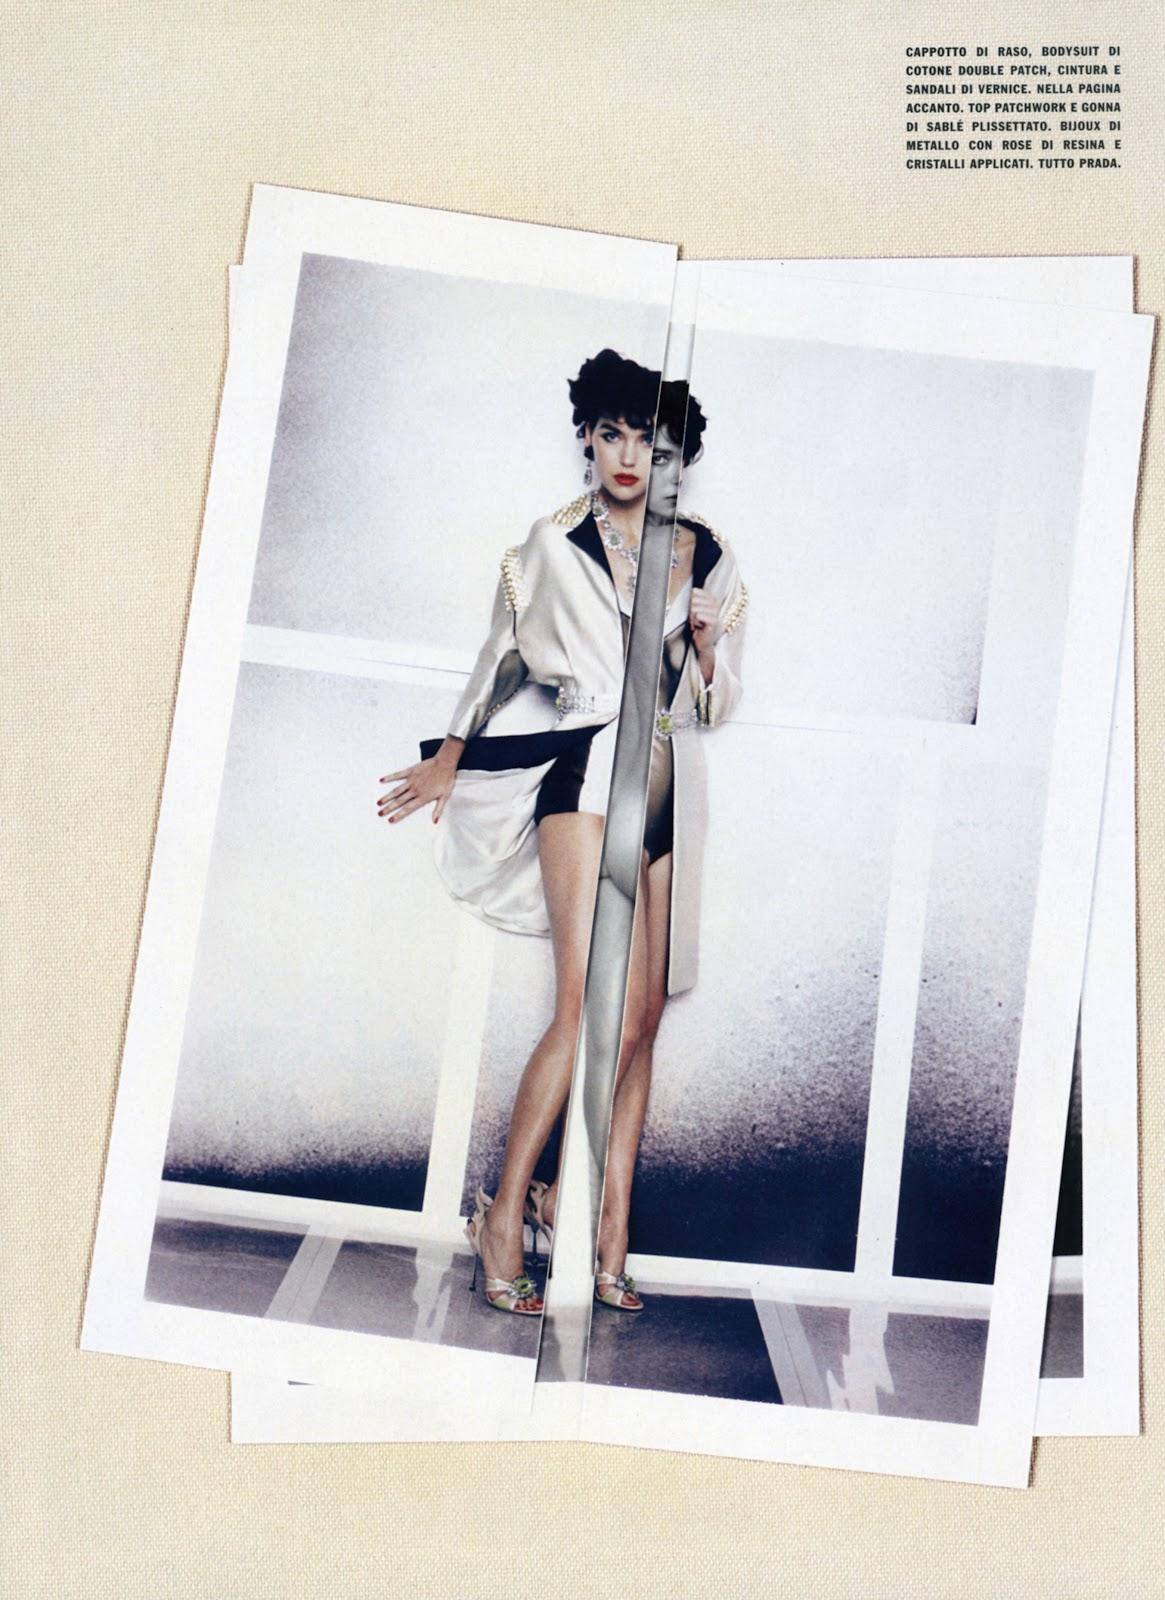 http://2.bp.blogspot.com/-P3ytTxAxYjs/T3oo90sTd5I/AAAAAAAAlvI/dFqQKOF286c/s1600/Arizona+Muse+by+Paolo+Roversi+for+Vogue+Italia+arizona-italia-9.jpeg